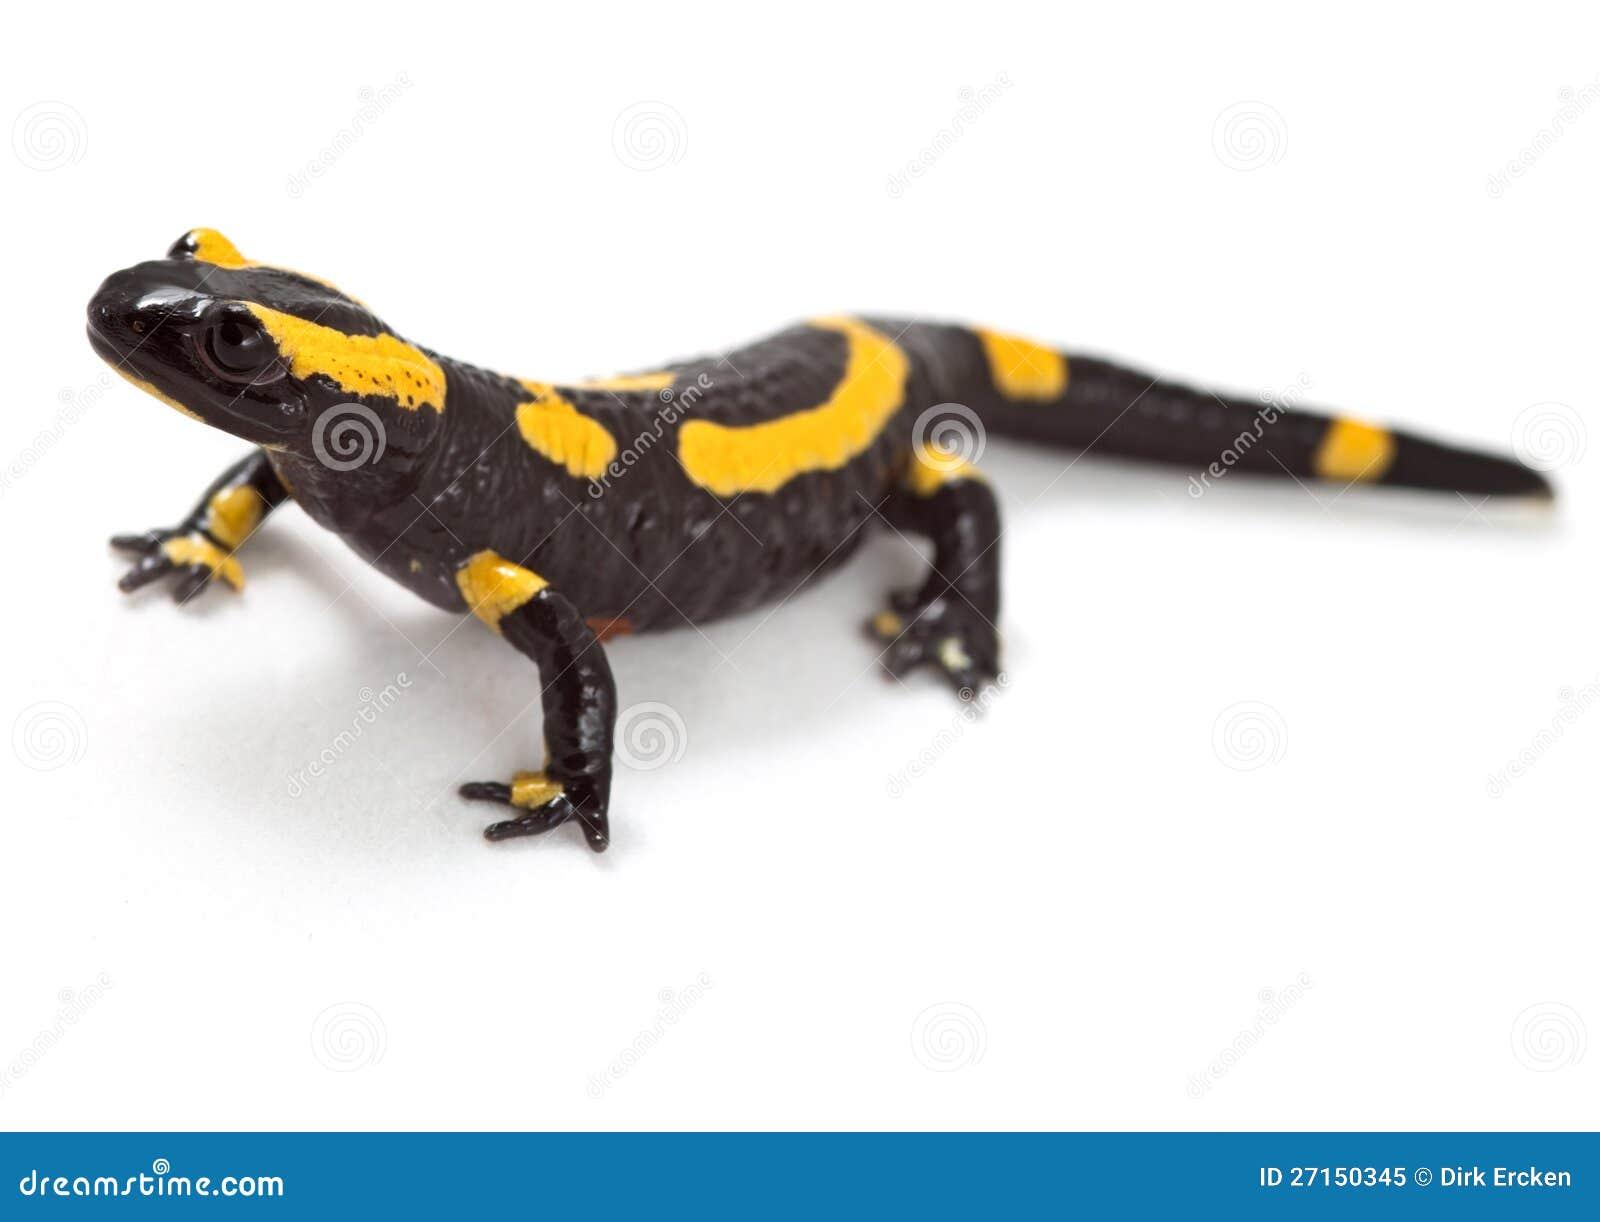 clipart newt - photo #48